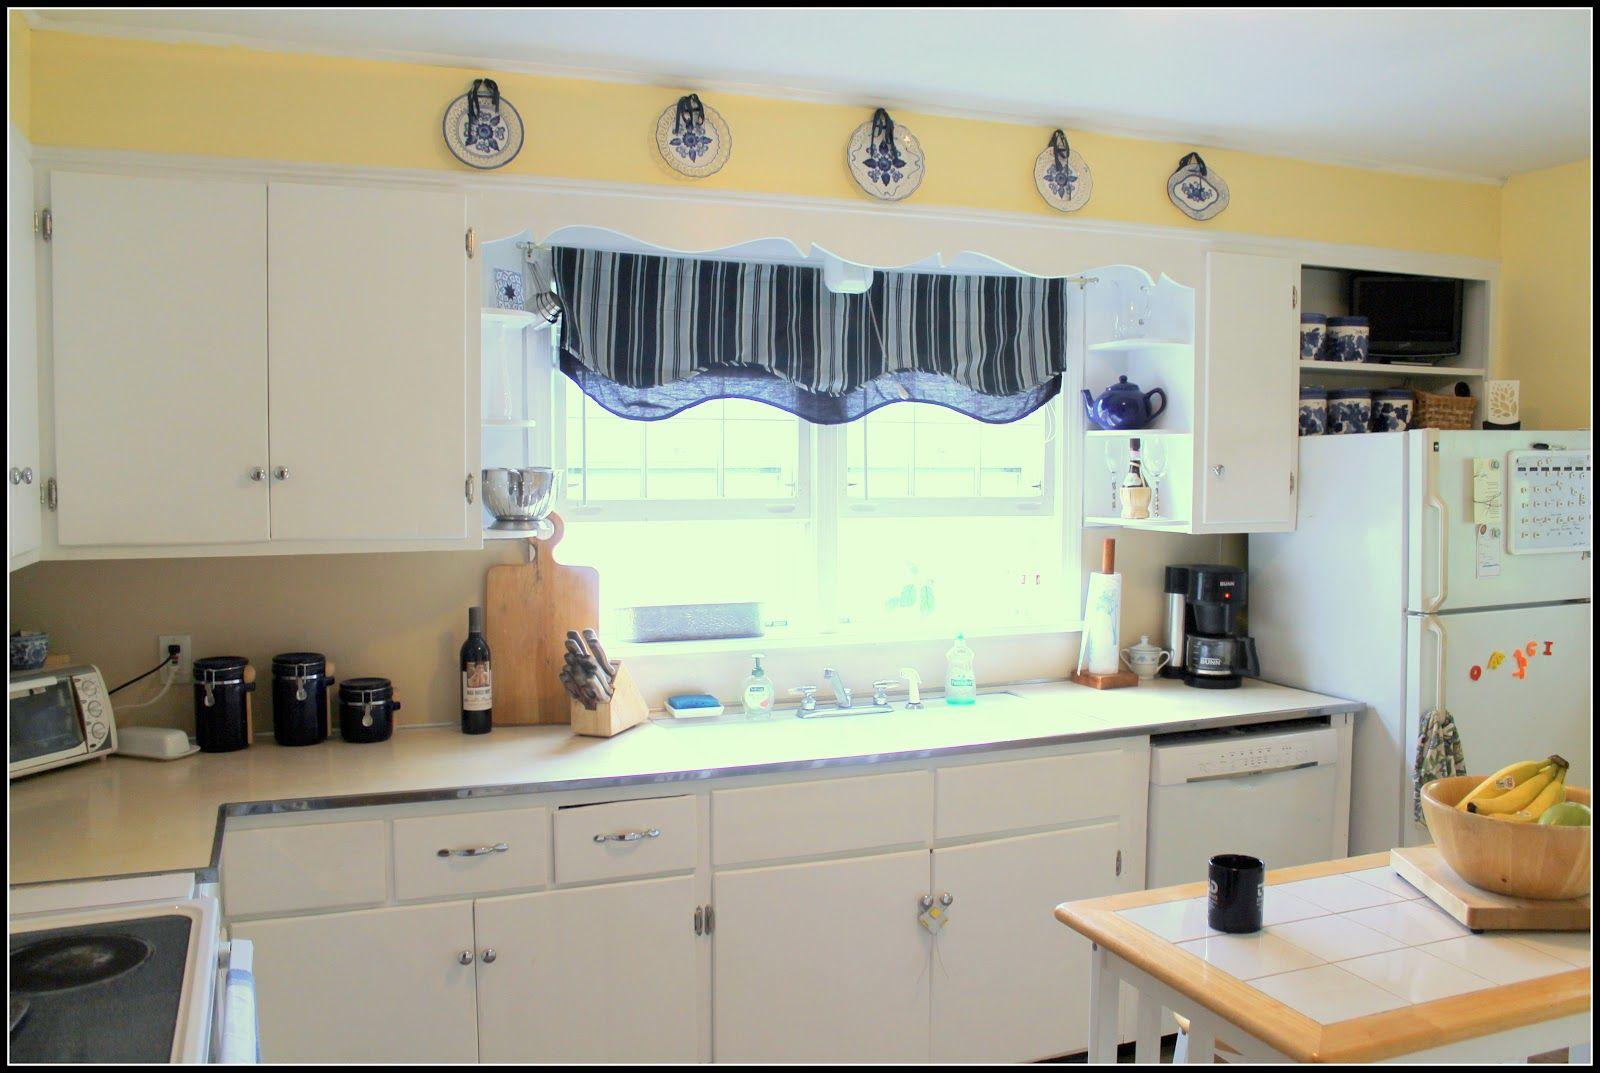 78 best images about kitchens on pinterest | kitchen backsplash